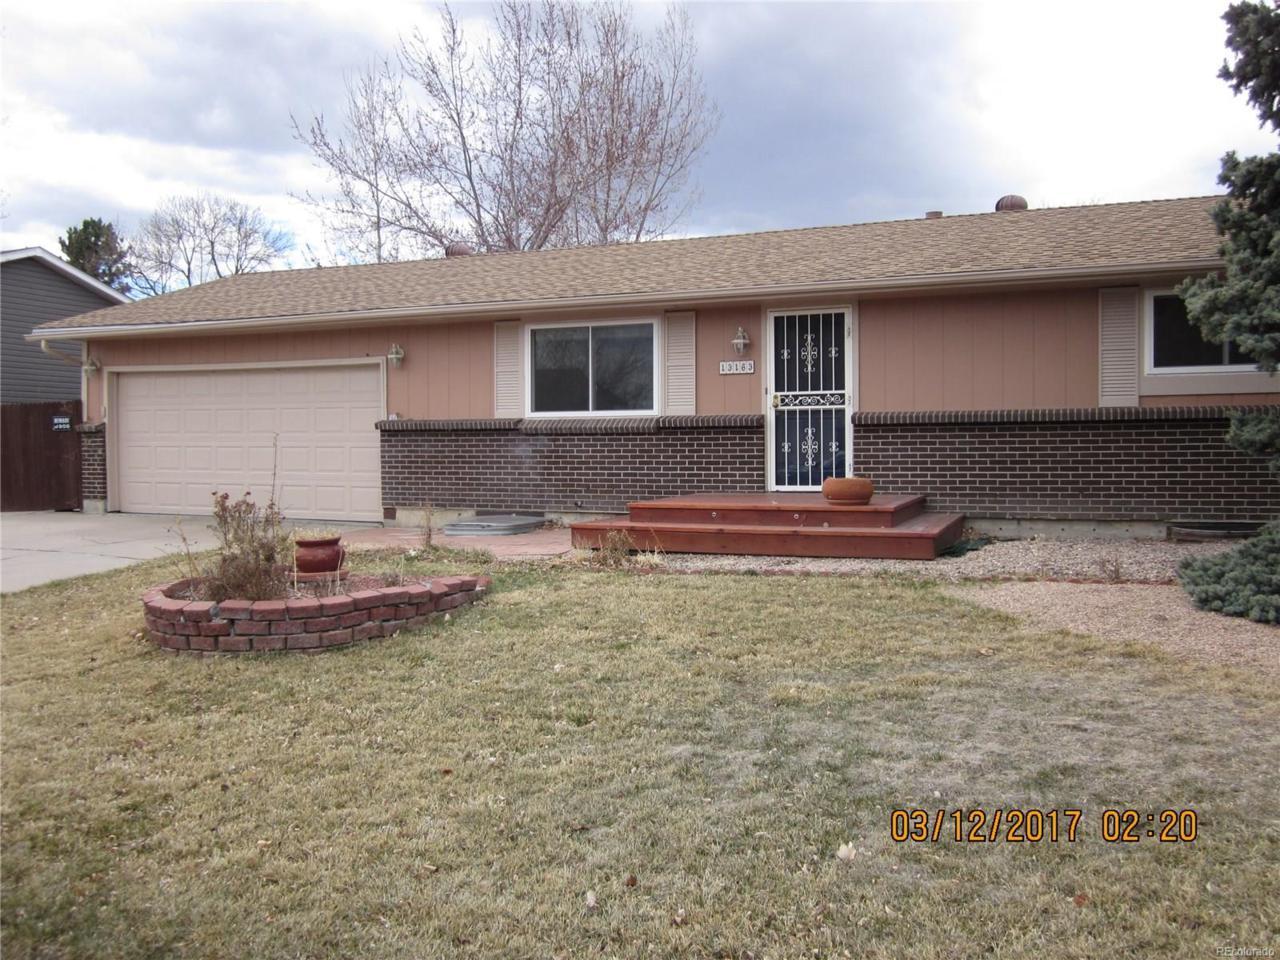 13163 Acres Green Drive, Littleton, CO 80124 (MLS #8167743) :: 8z Real Estate